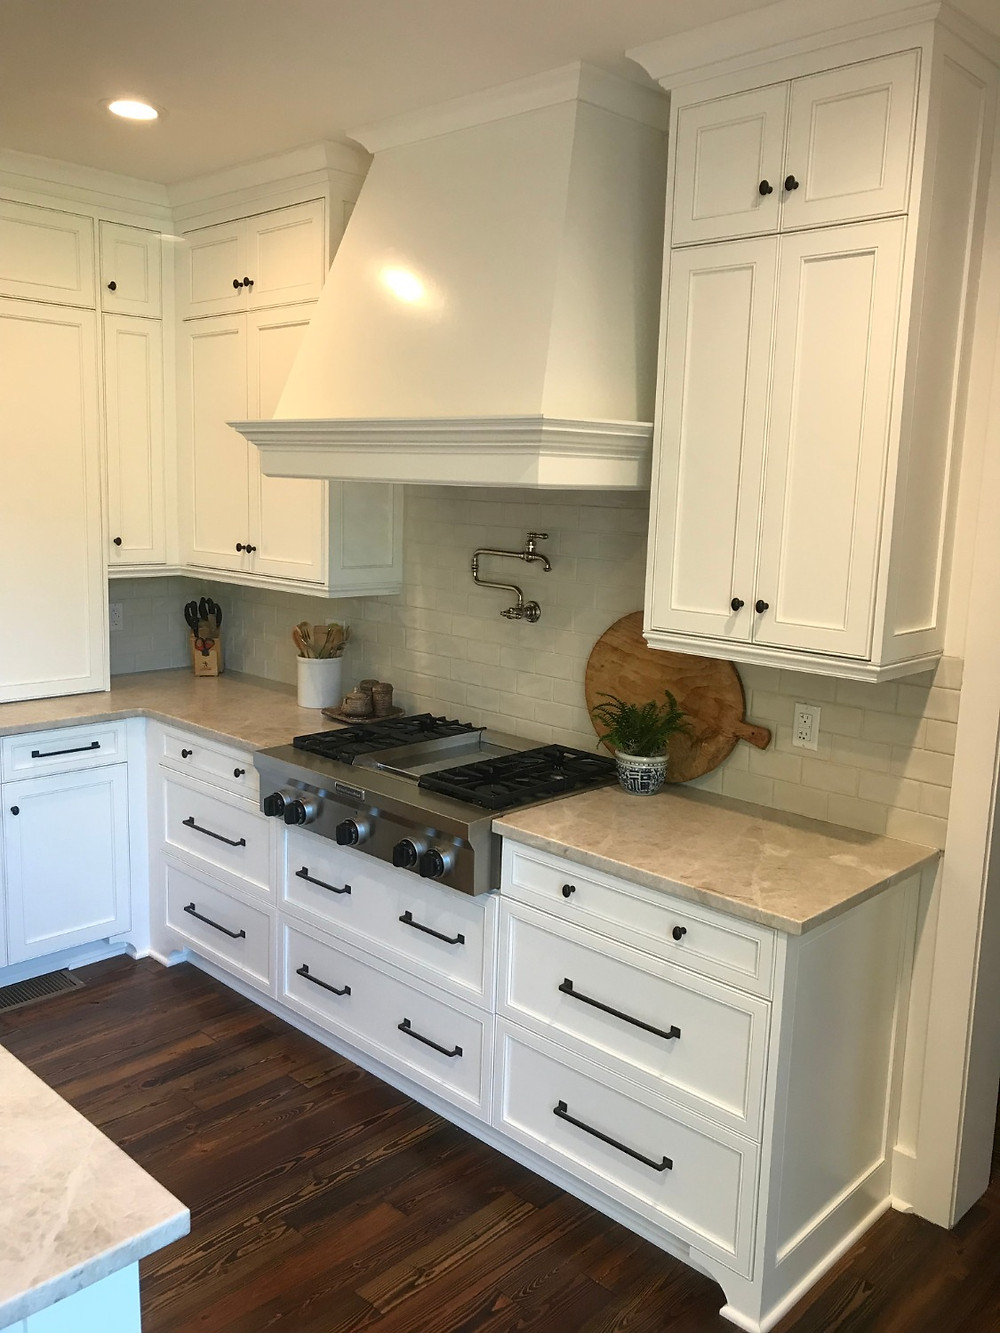 mccarley cabinets modern kitchen layout cook zone